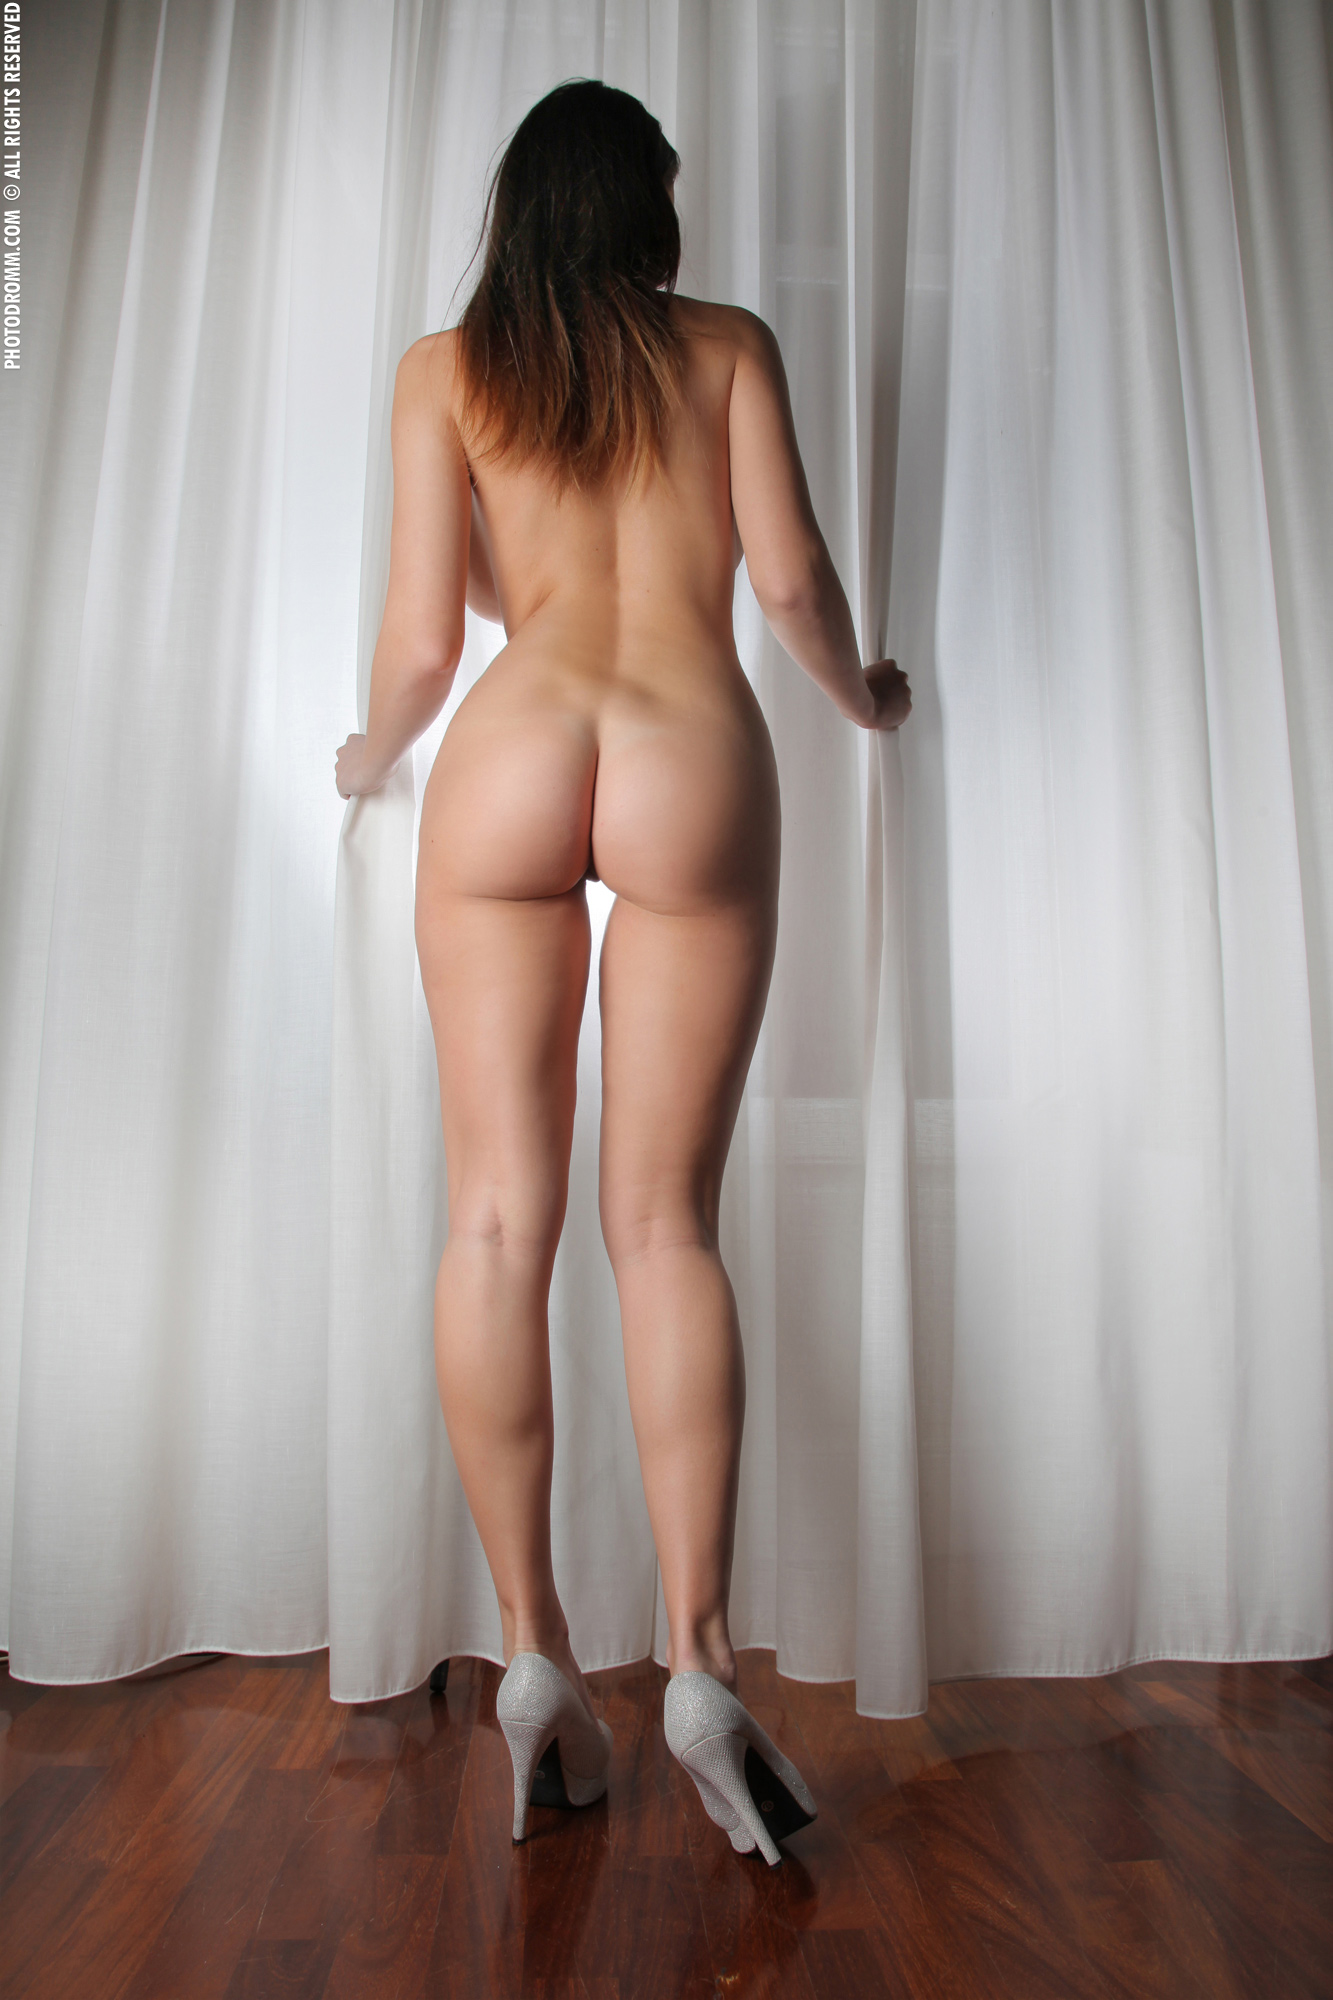 black girl nude sex foto